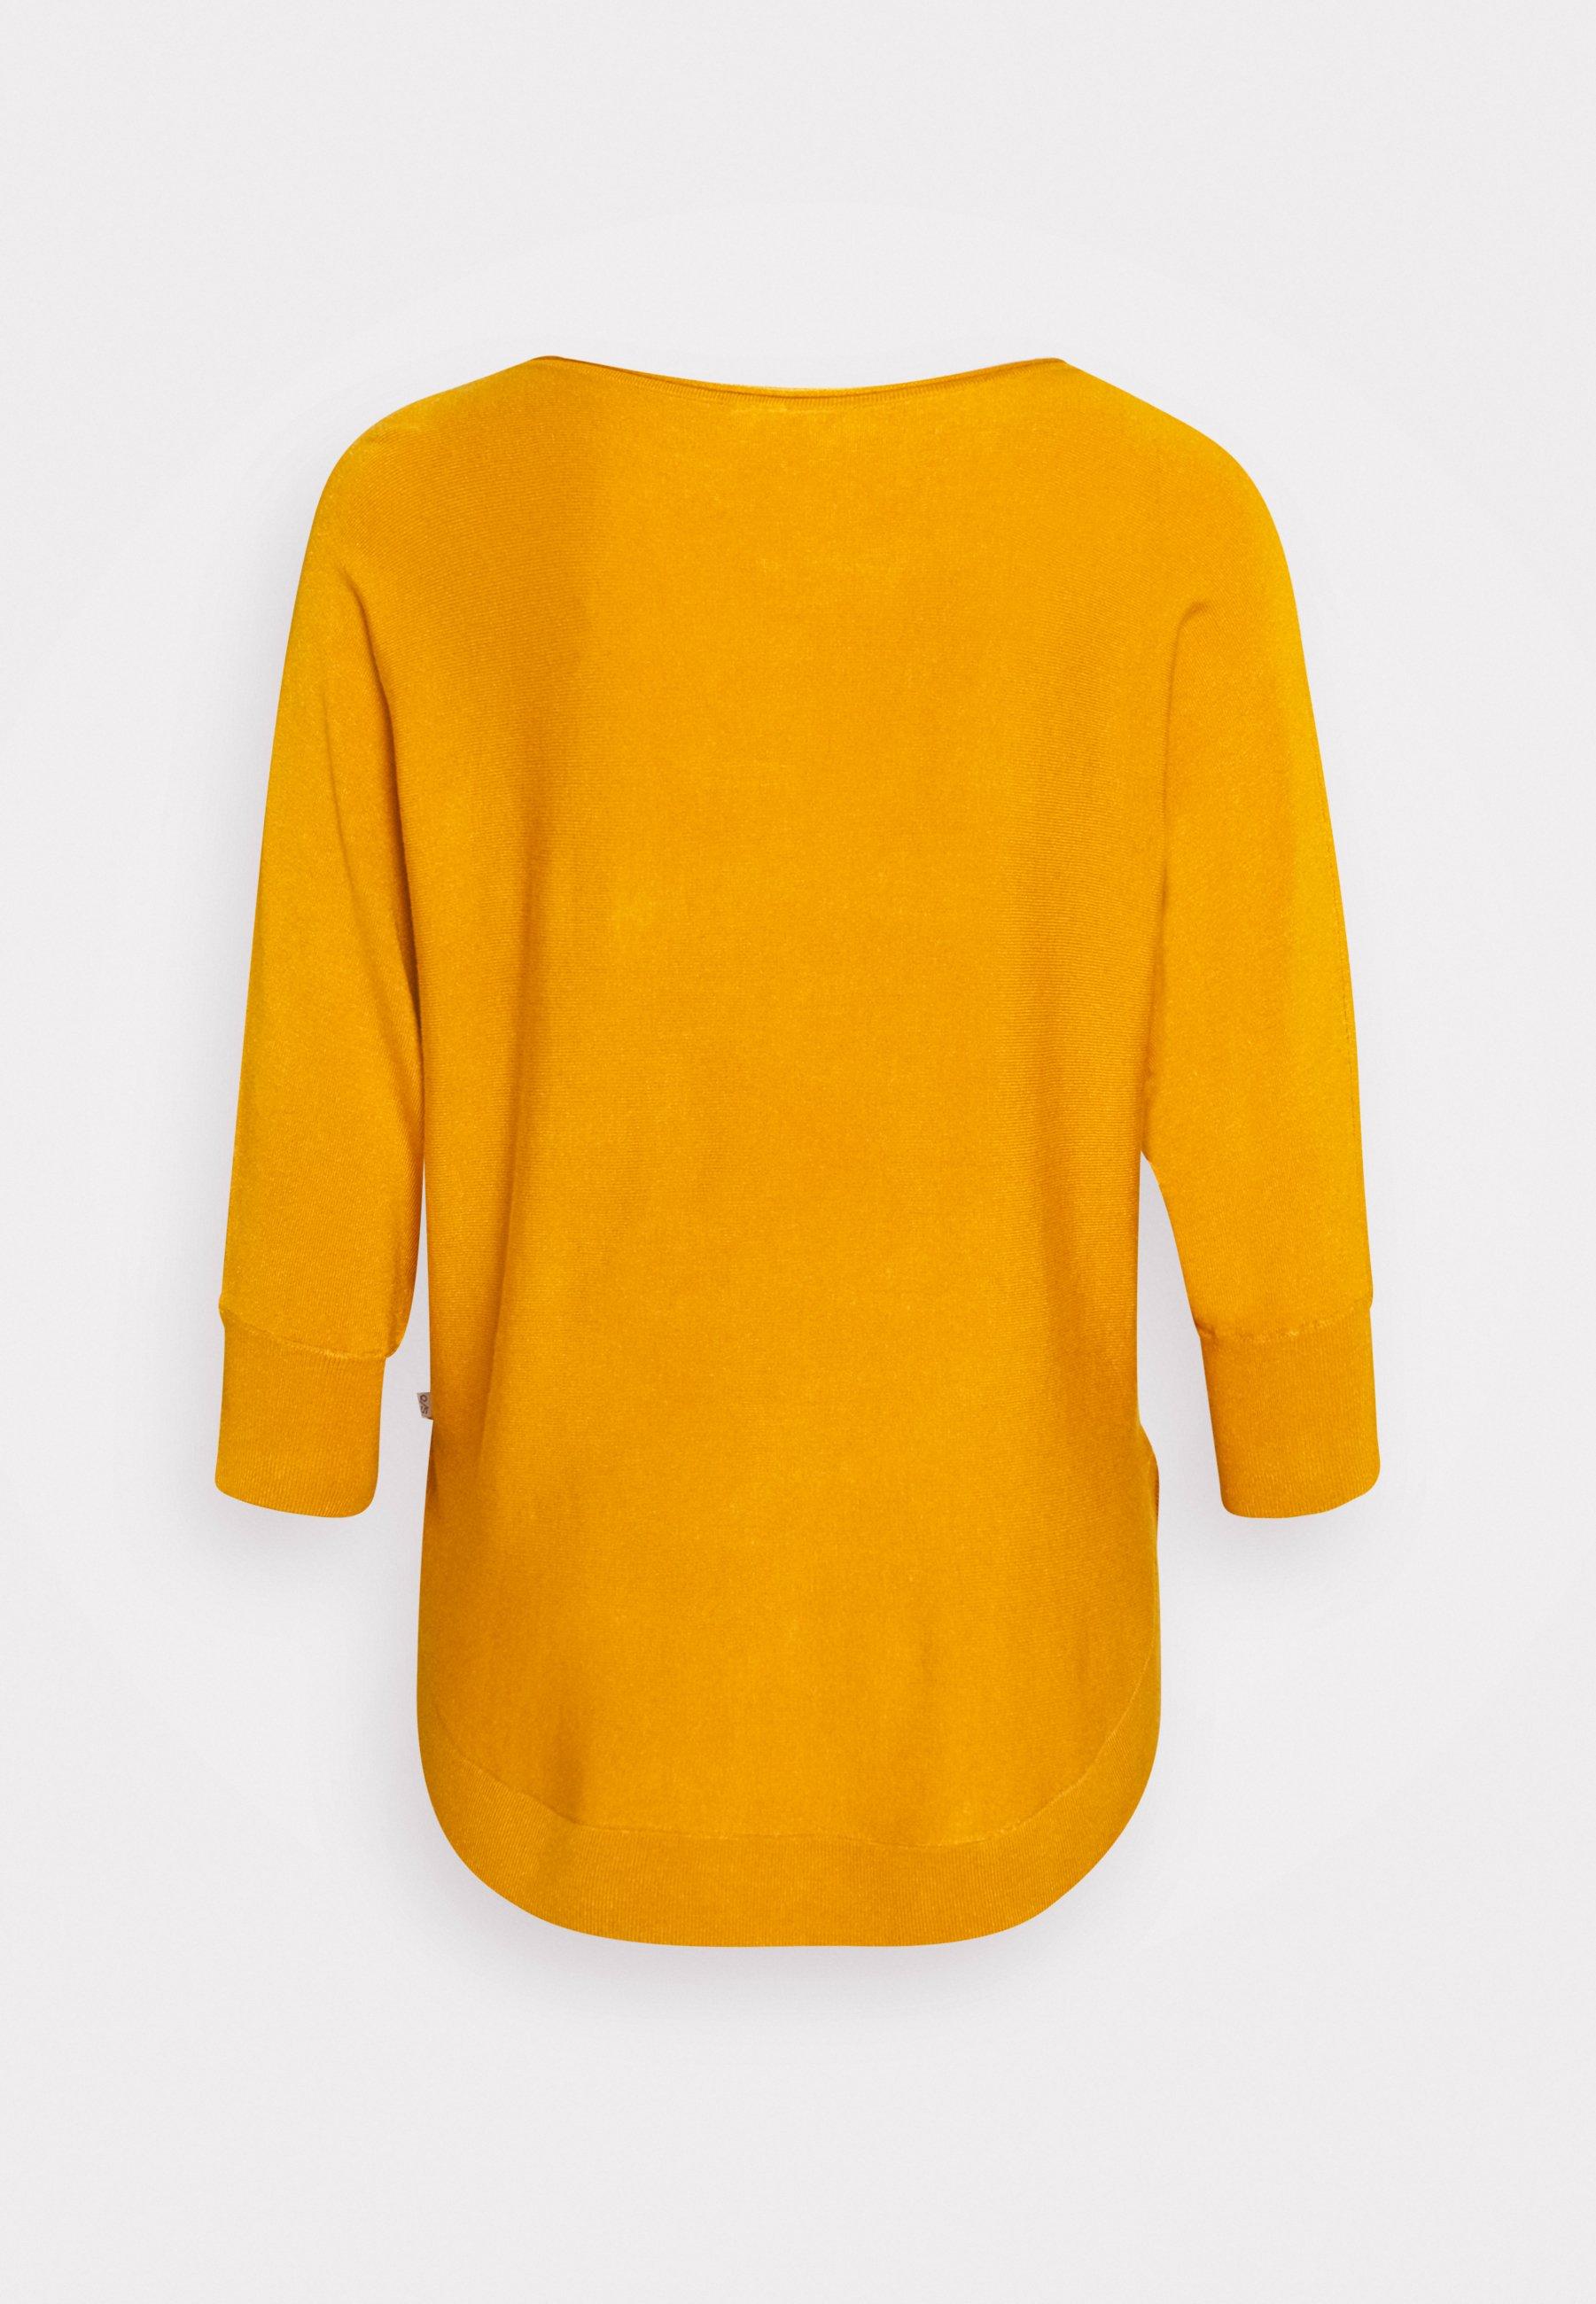 s.Oliver LANGARM Pullover yellow ZALANDO.FR